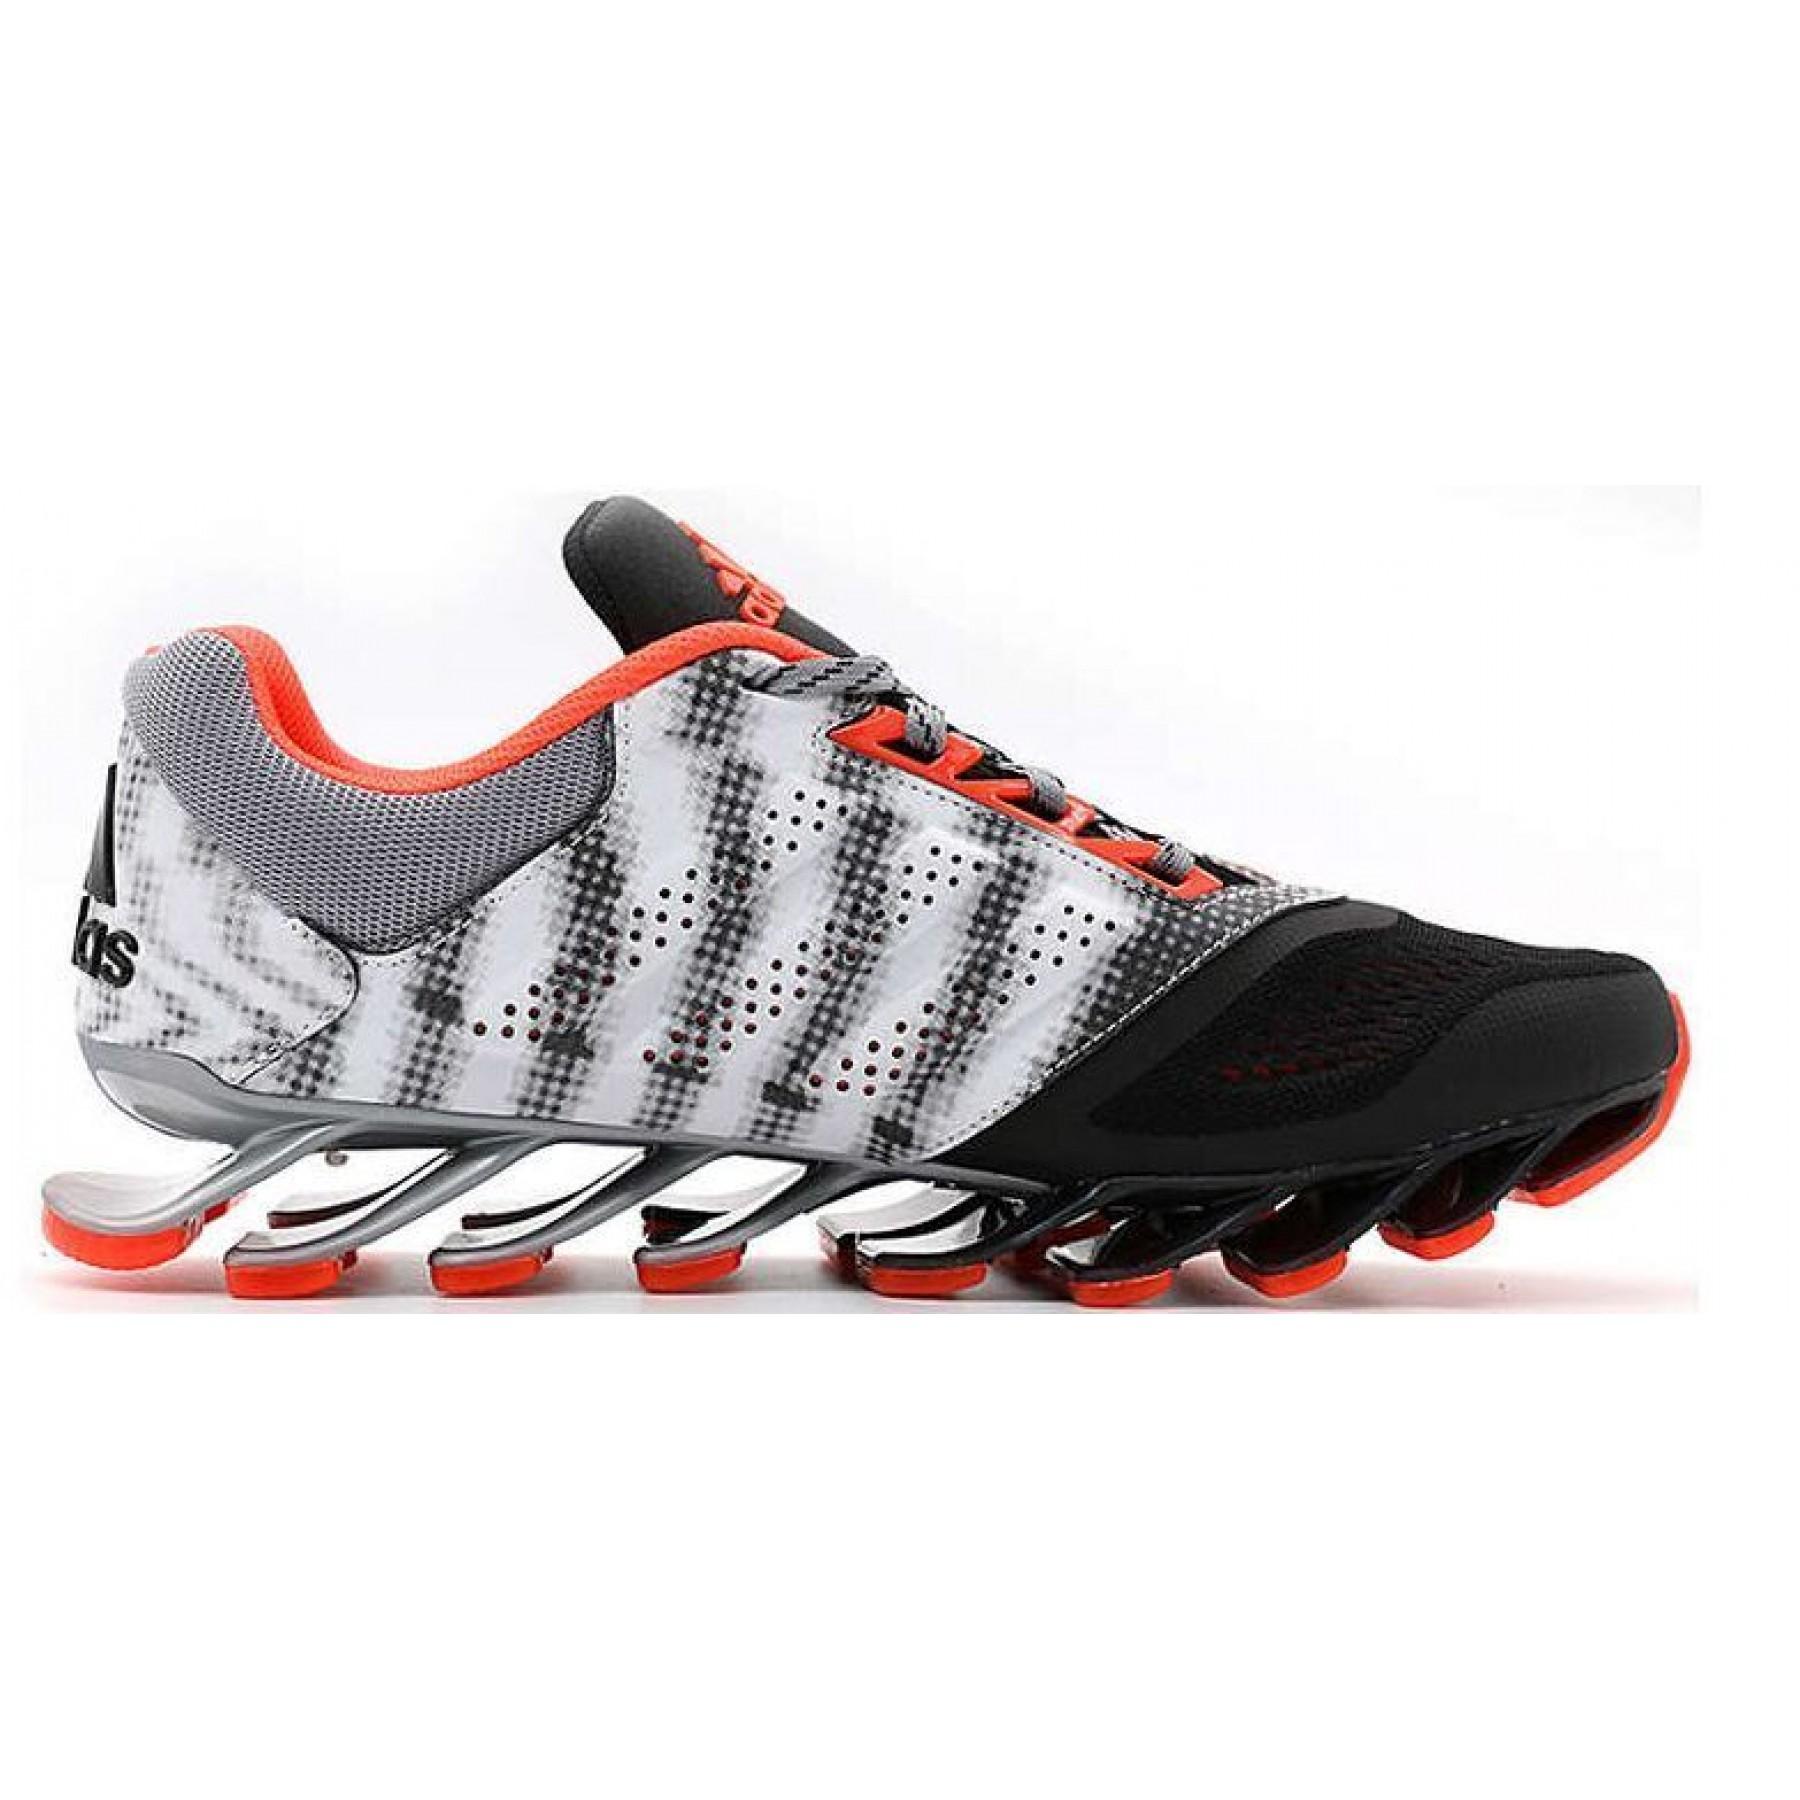 2015 homme chaussure adidas springblade drive 2.0 noir nacarat